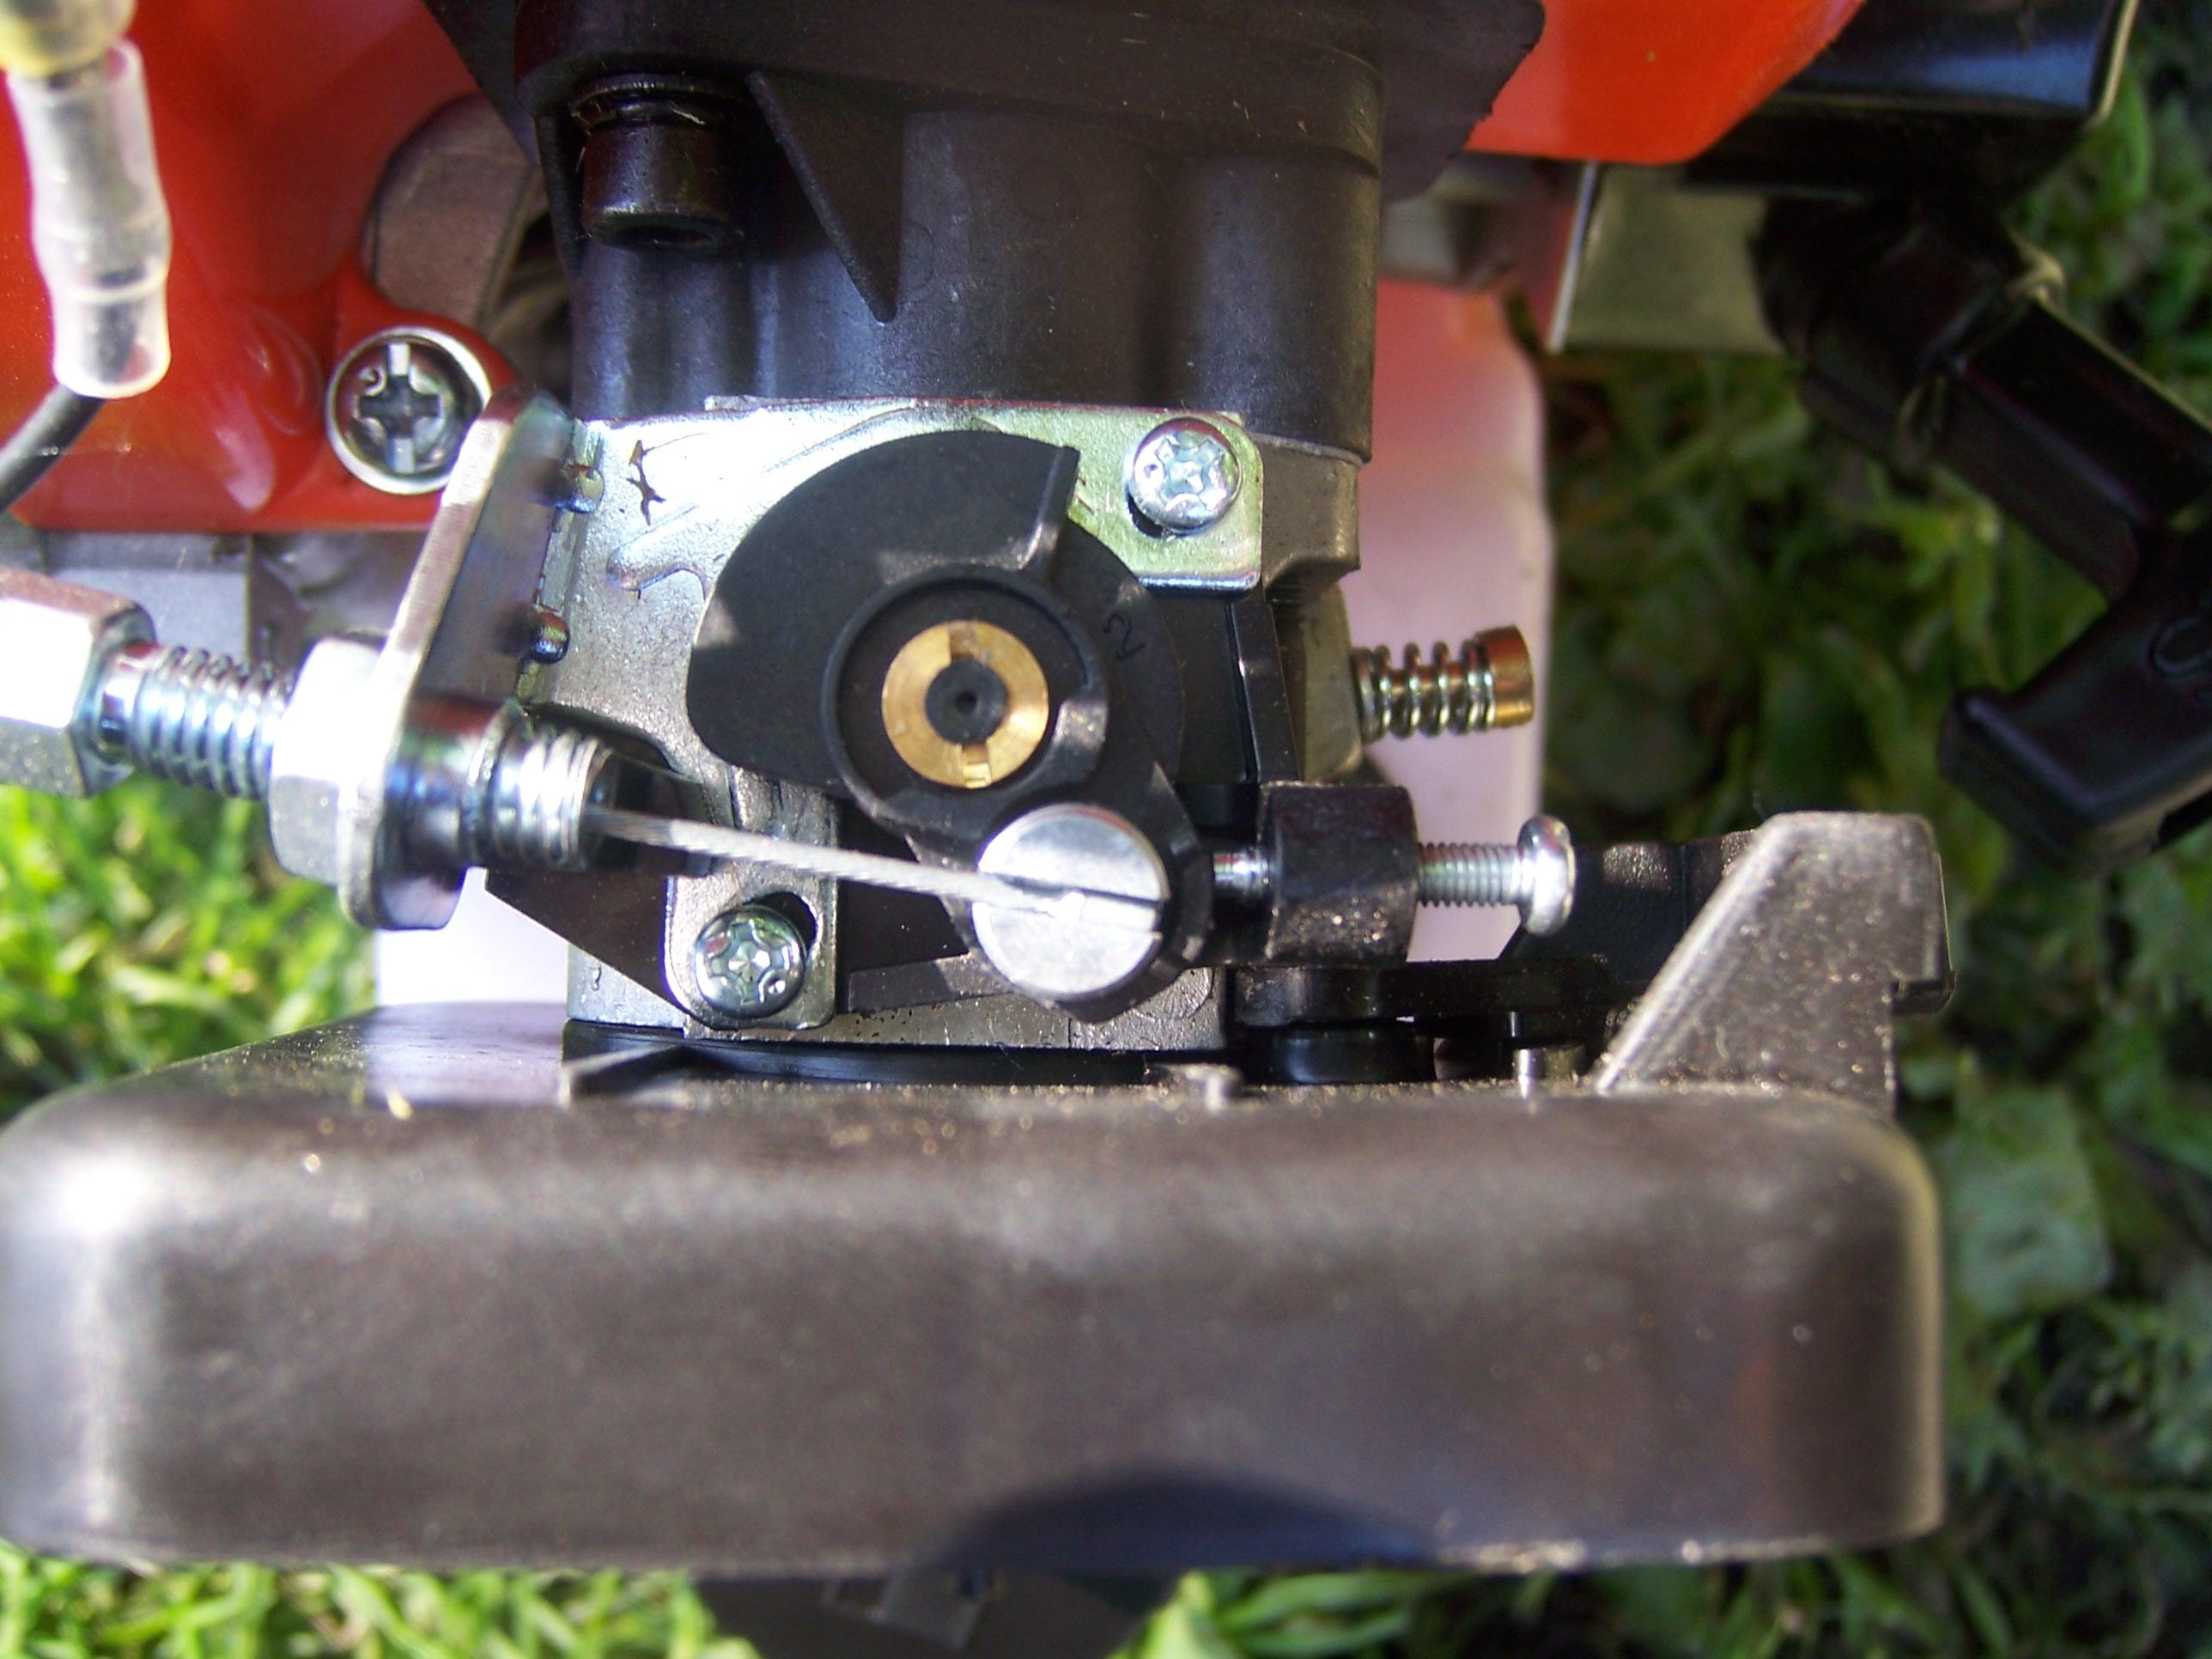 CG 520 - Kosa black nie odpala, �le wyregulowany ga�nik?